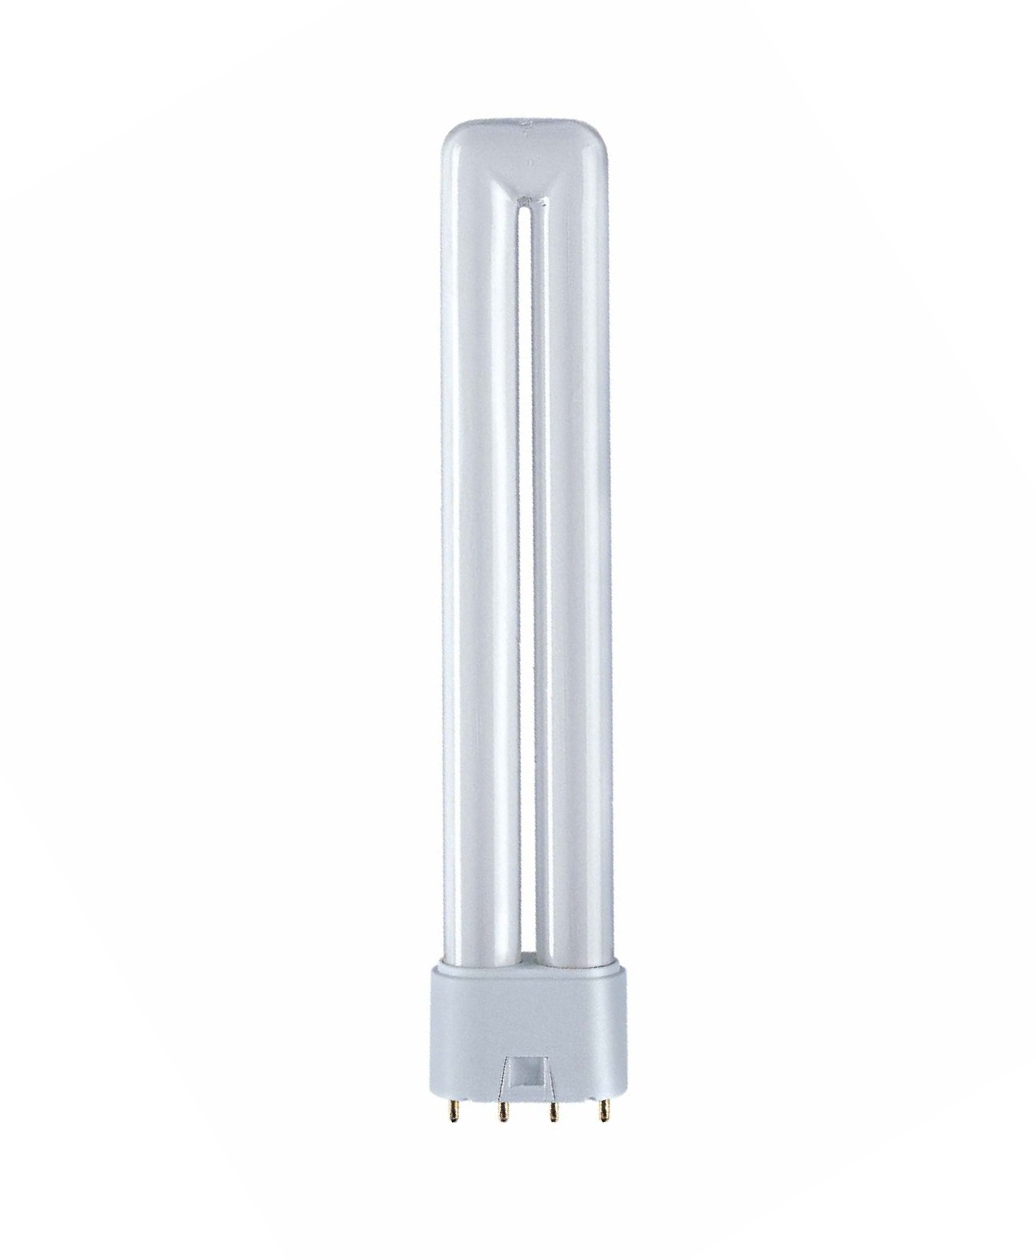 Tc L 55w 830 2g11 Warmwhite Compact Fluorescent Lamp Online Shop Use A Relay Or Smart Switch With The 45 Watt Higher Halogen Lights Schrack Technik International